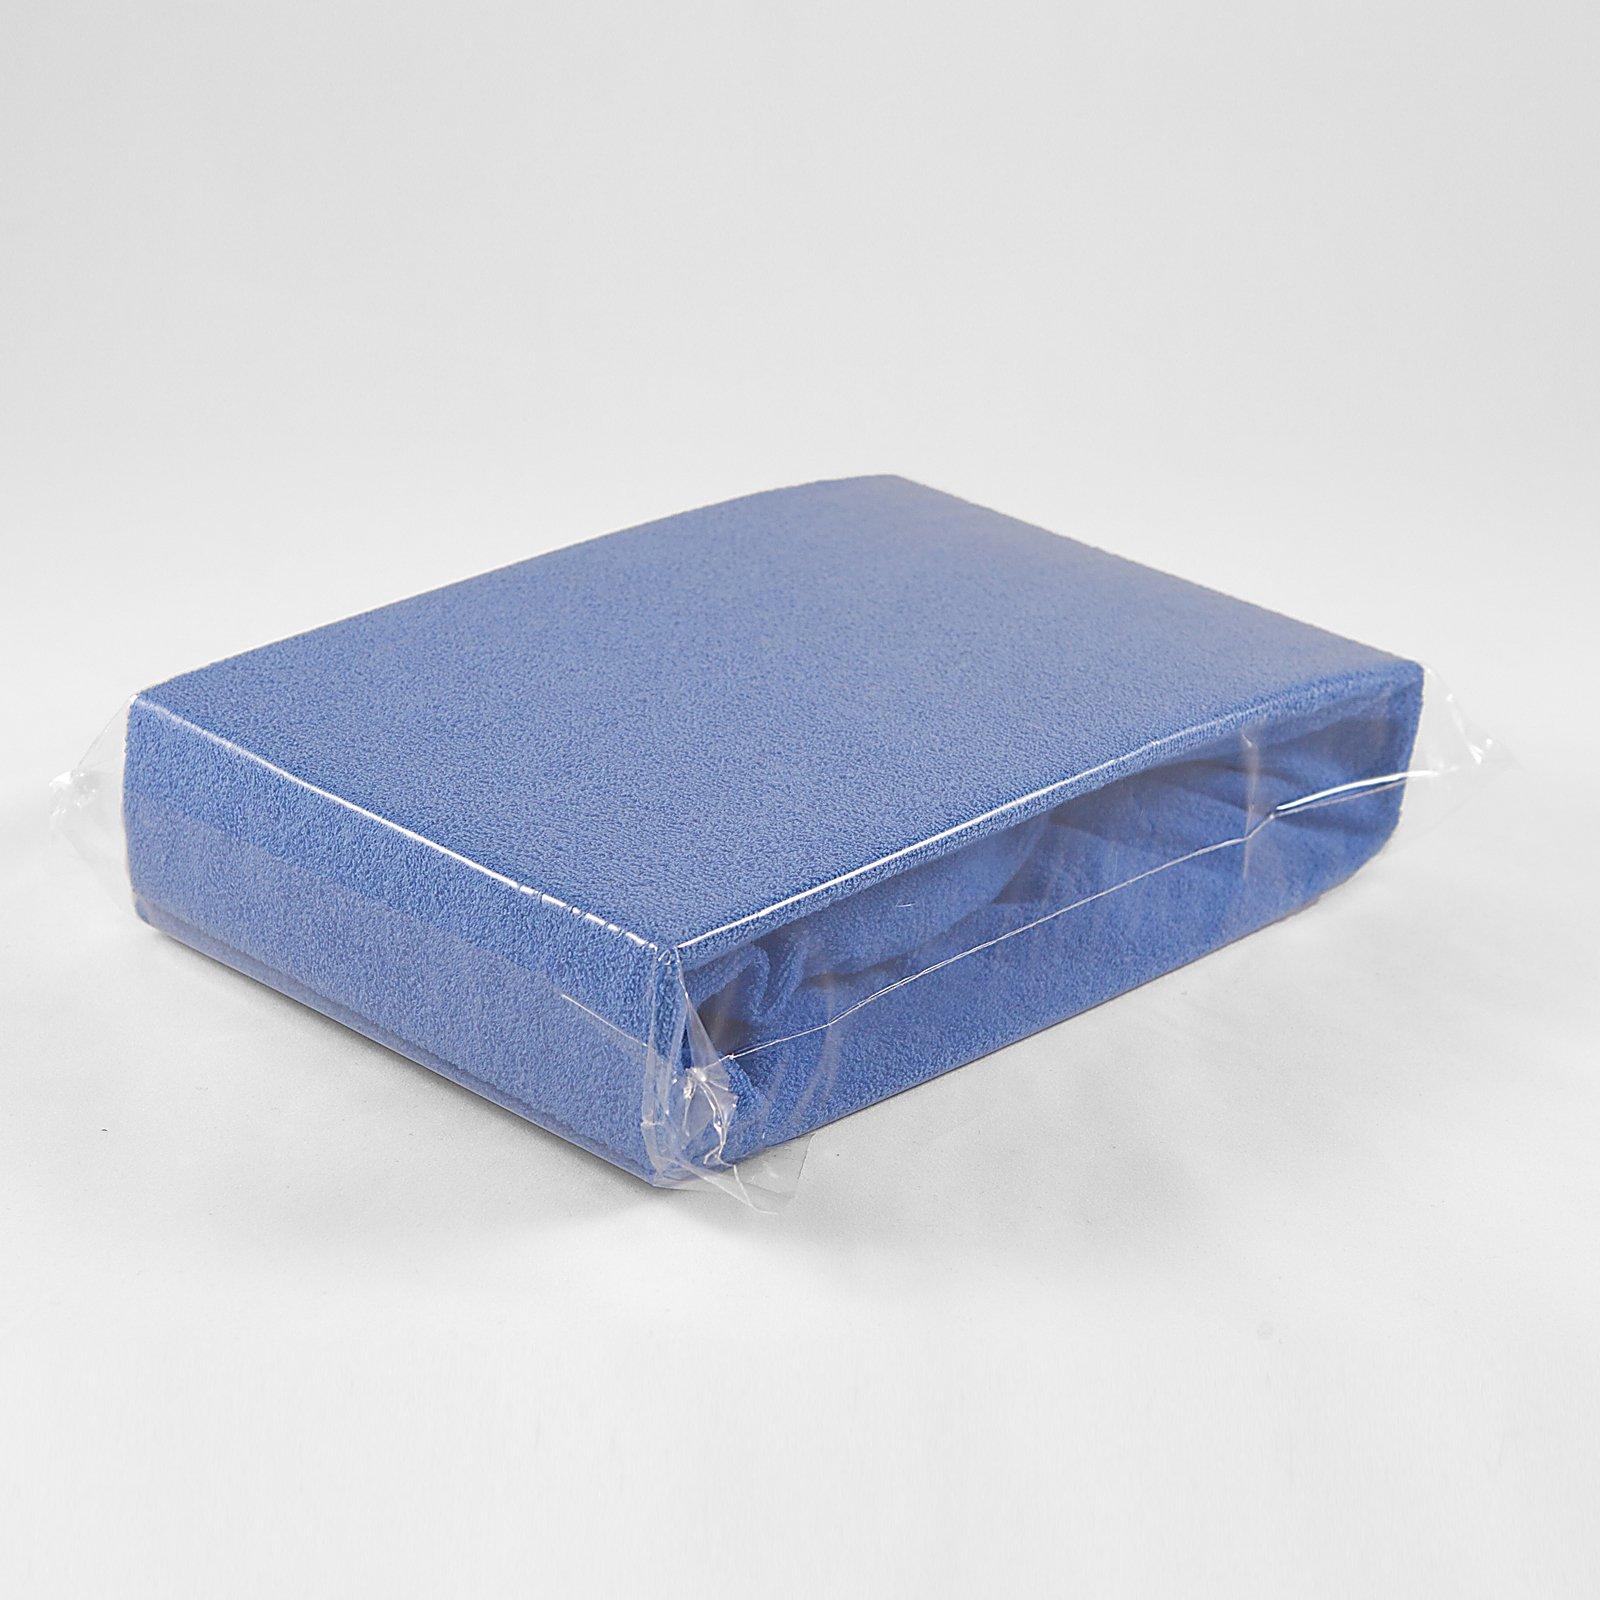 Latex Matratze 60 x 120 cm Frottee Spannbettlaken blau Kinder Latexkernmatratze